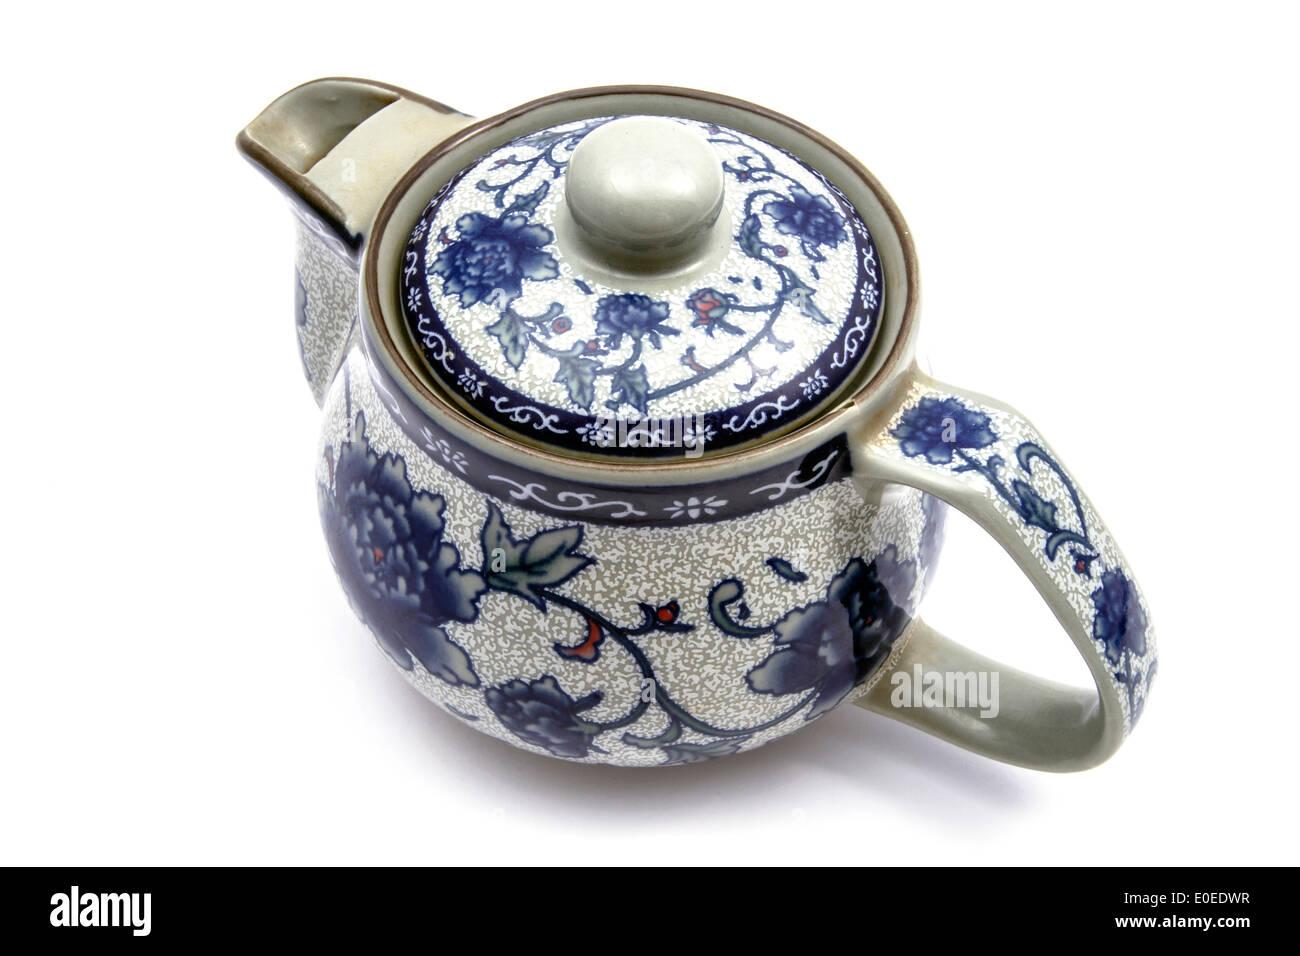 Chinese tea pot isolated on white background - Stock Image